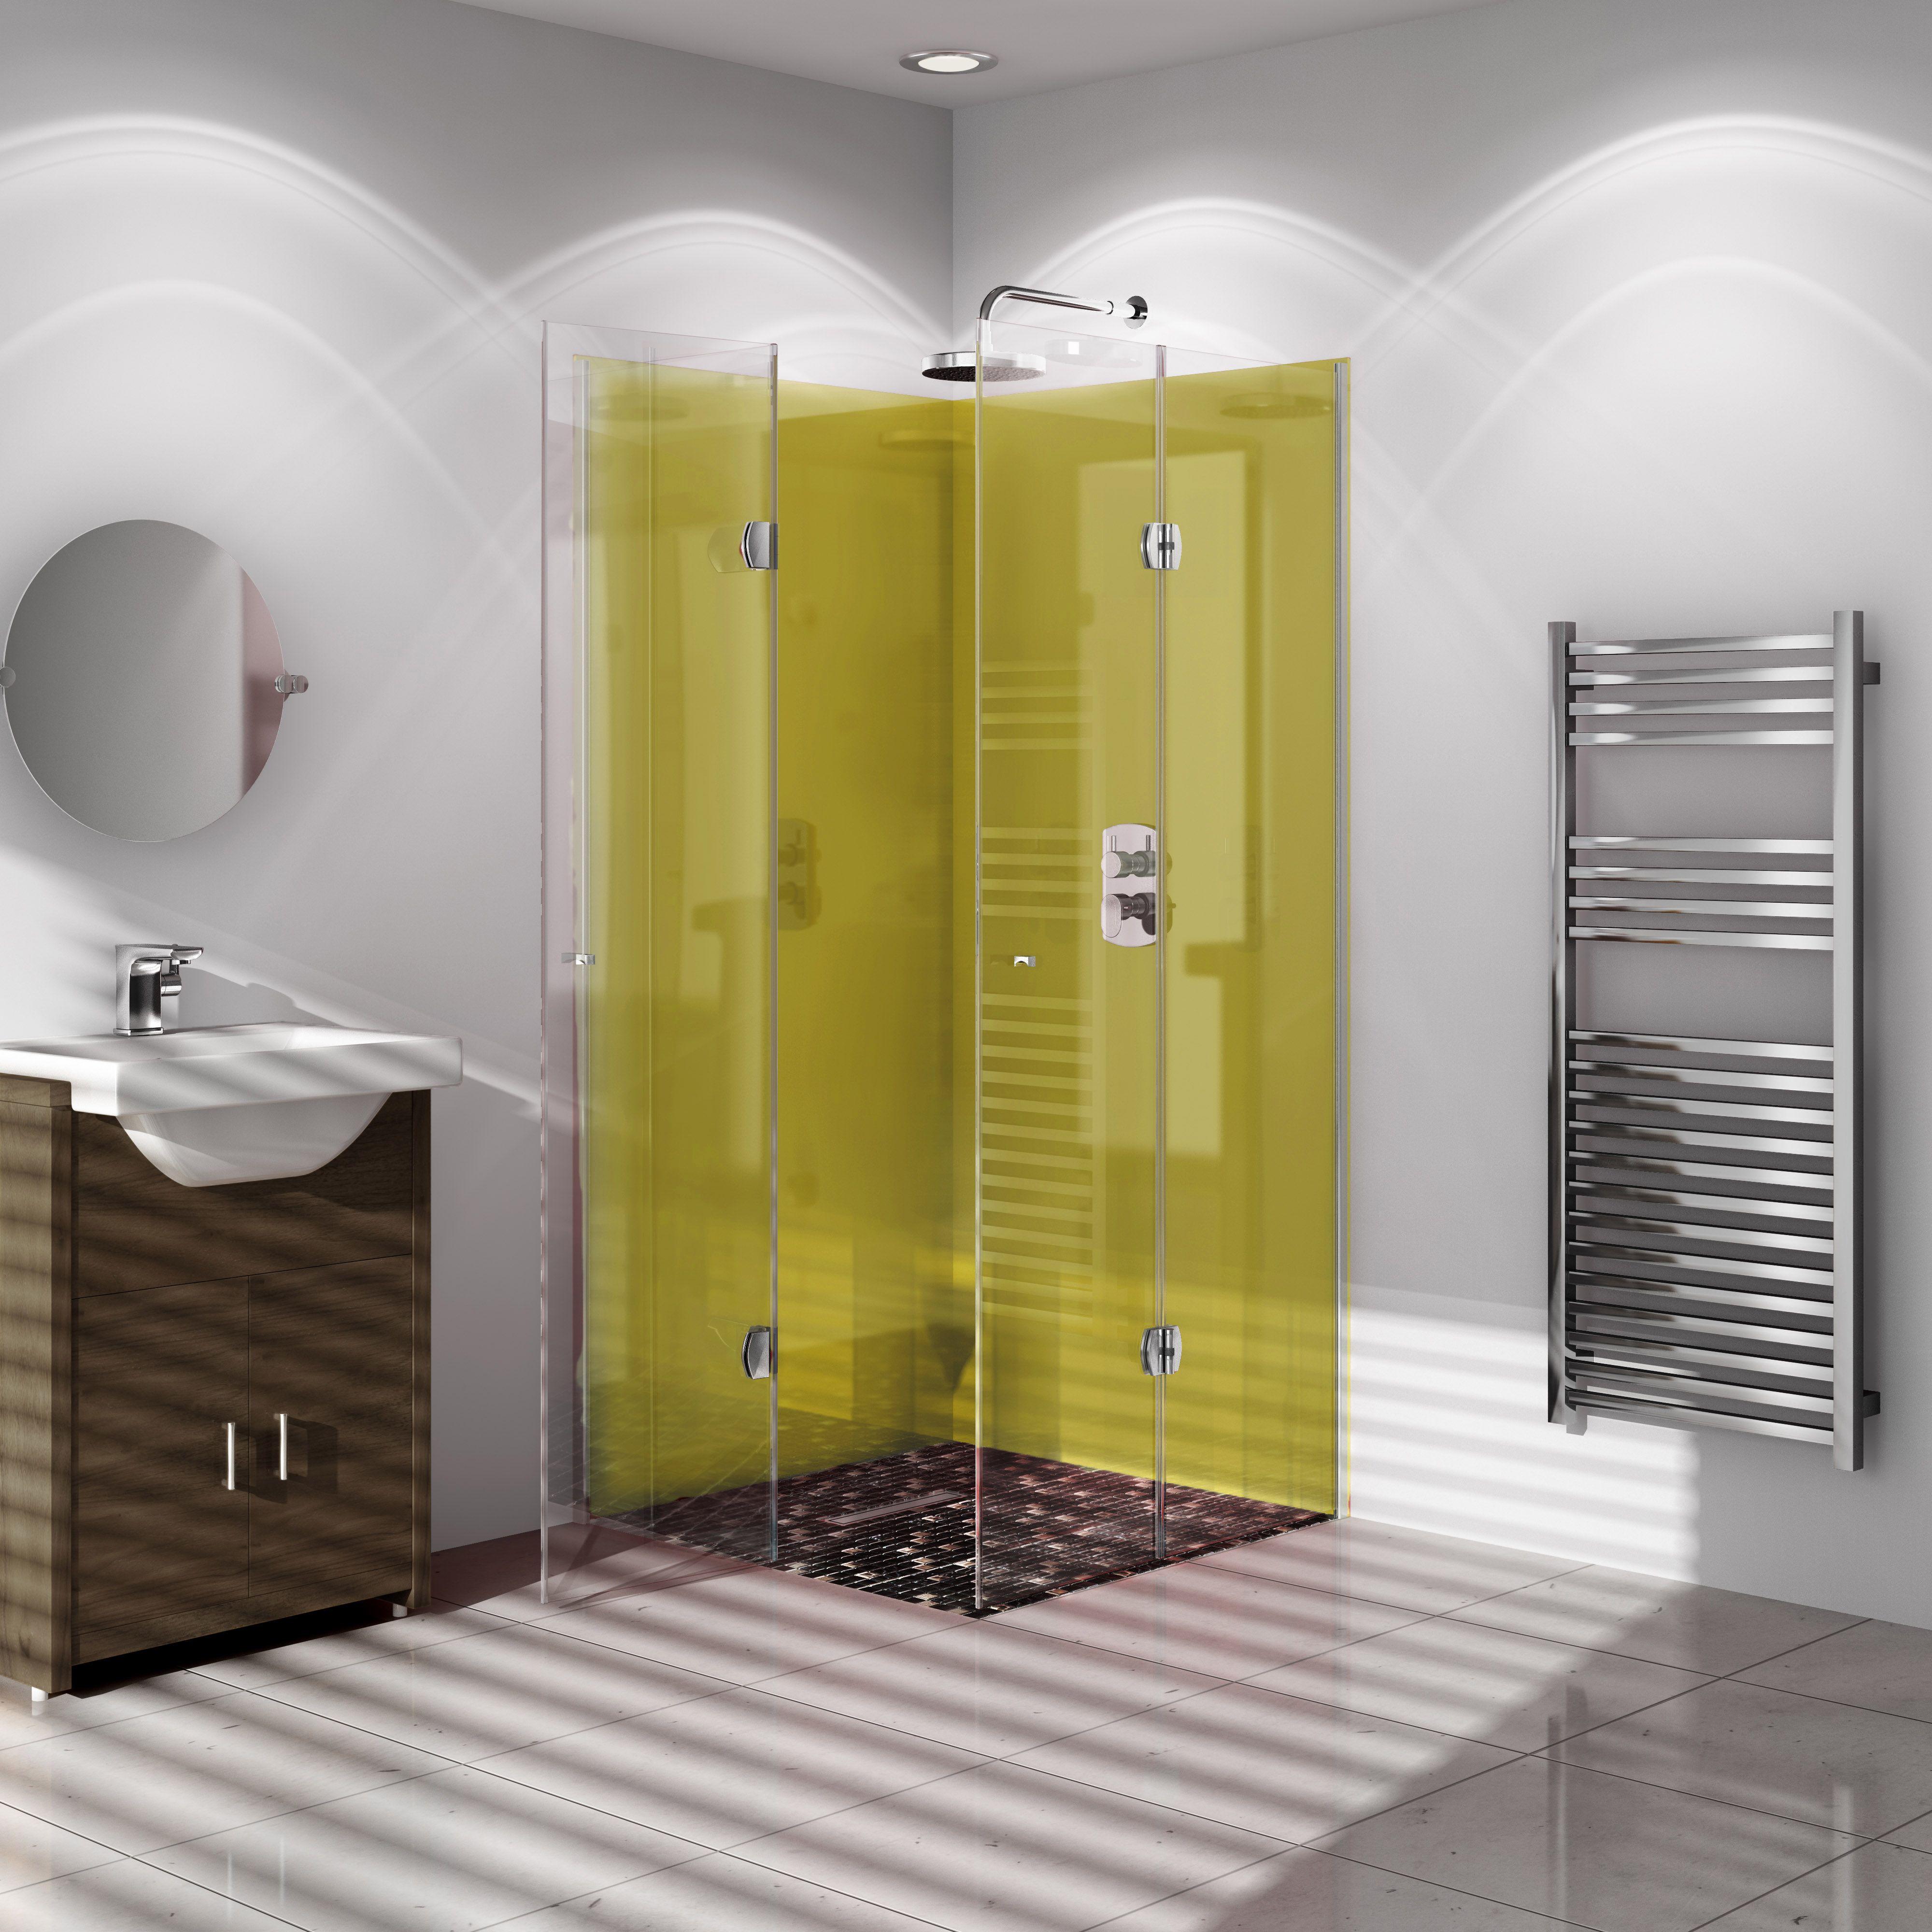 Vistelle Forest Single Shower Panel L 2 07m W 1m T 4mm Departments Diy At B Amp Q